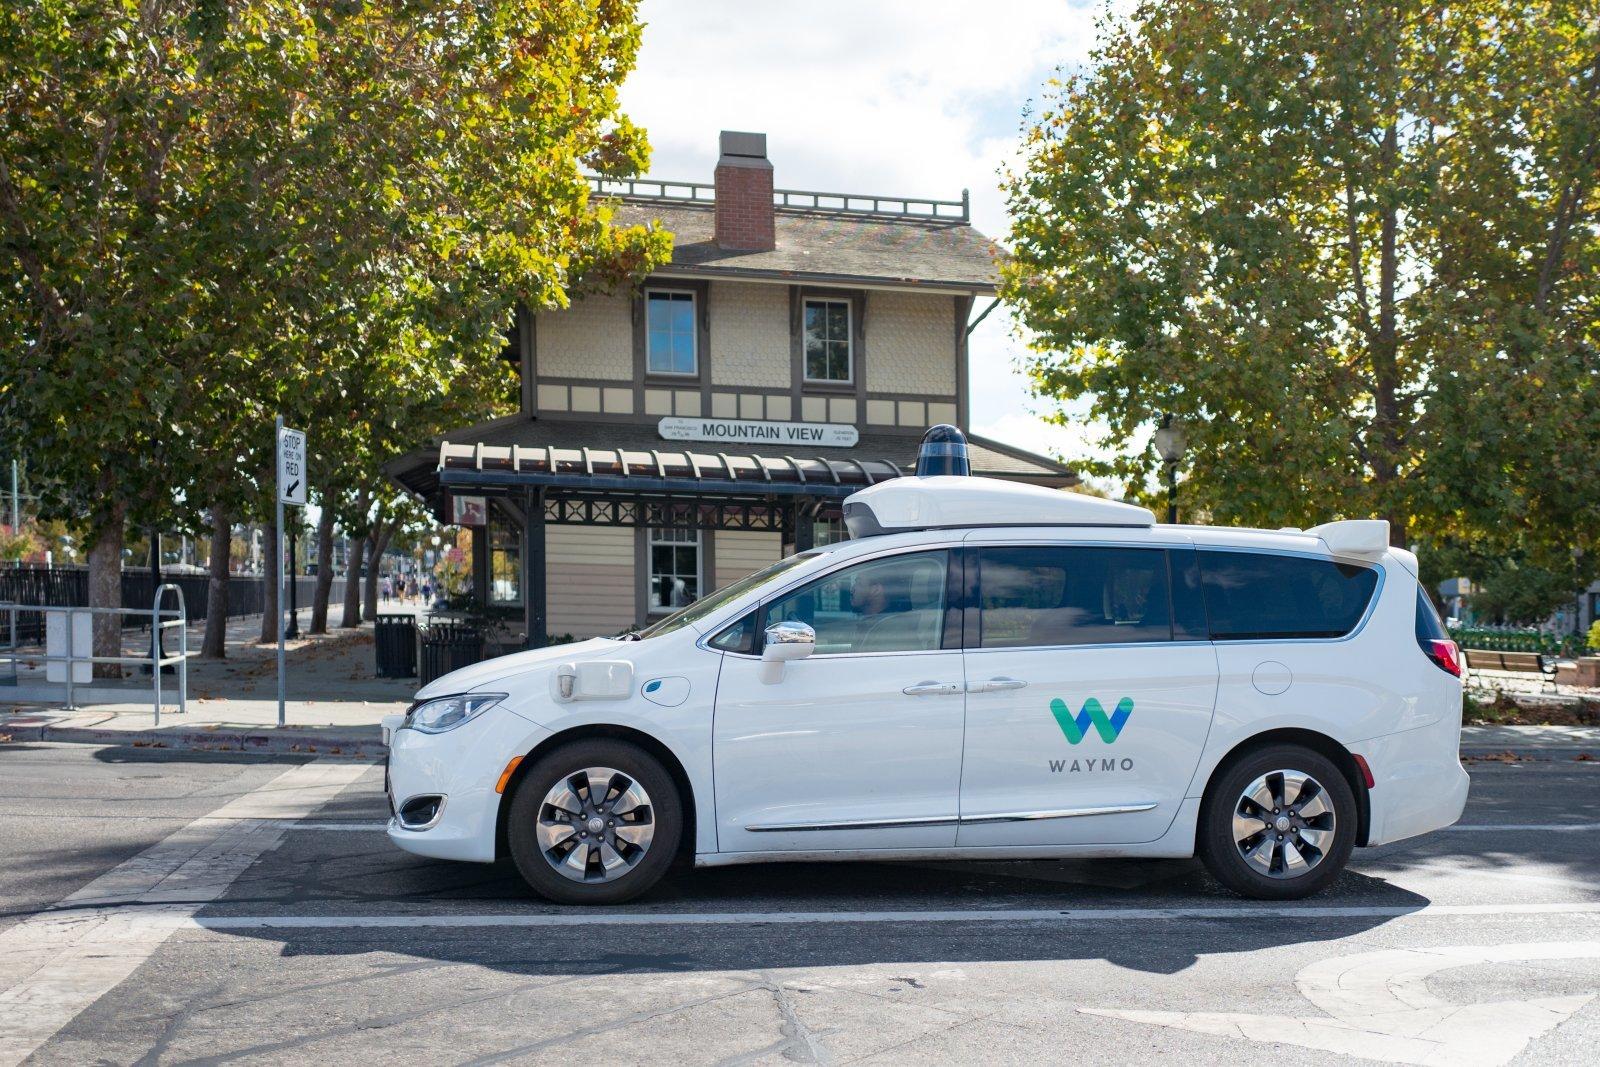 Waymo自动驾驶汽车人工干预率每万英里仅一次